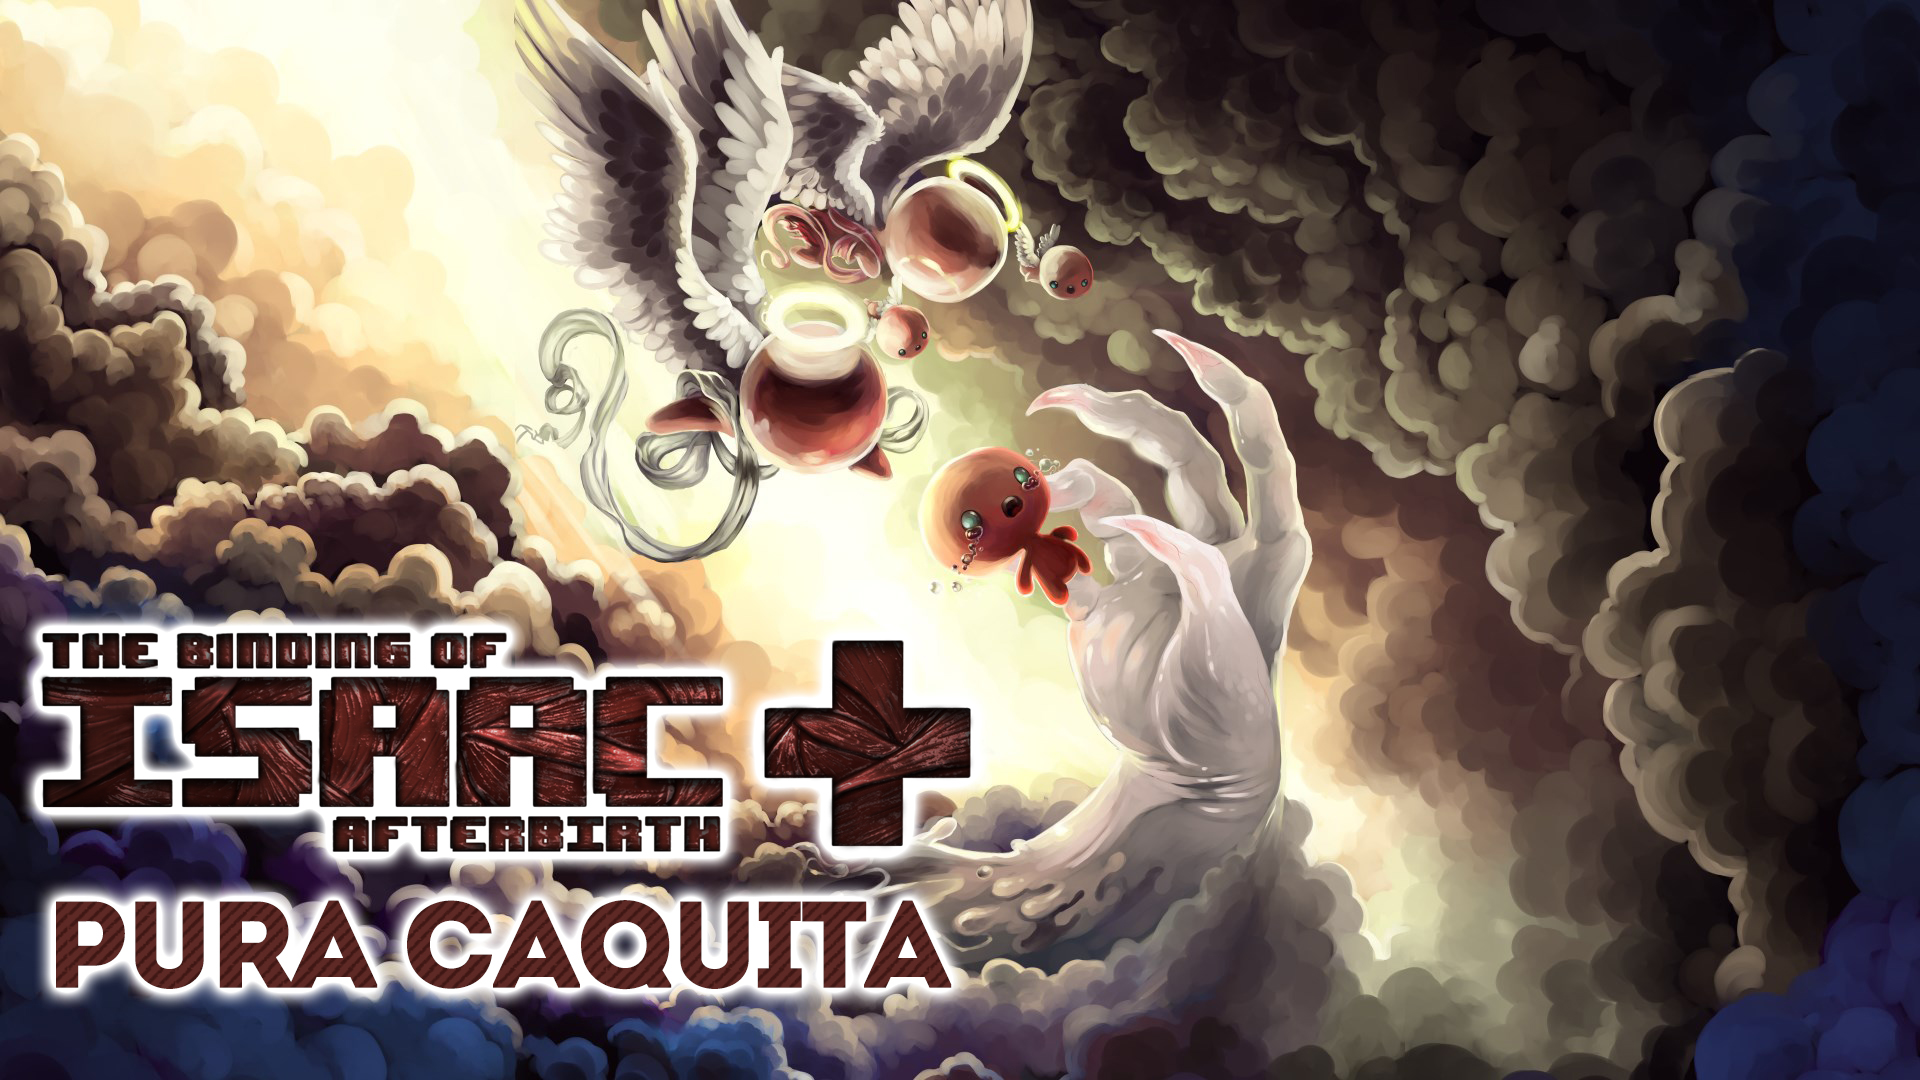 The Binding of Isaac Afterbirth + – Pura Caquita